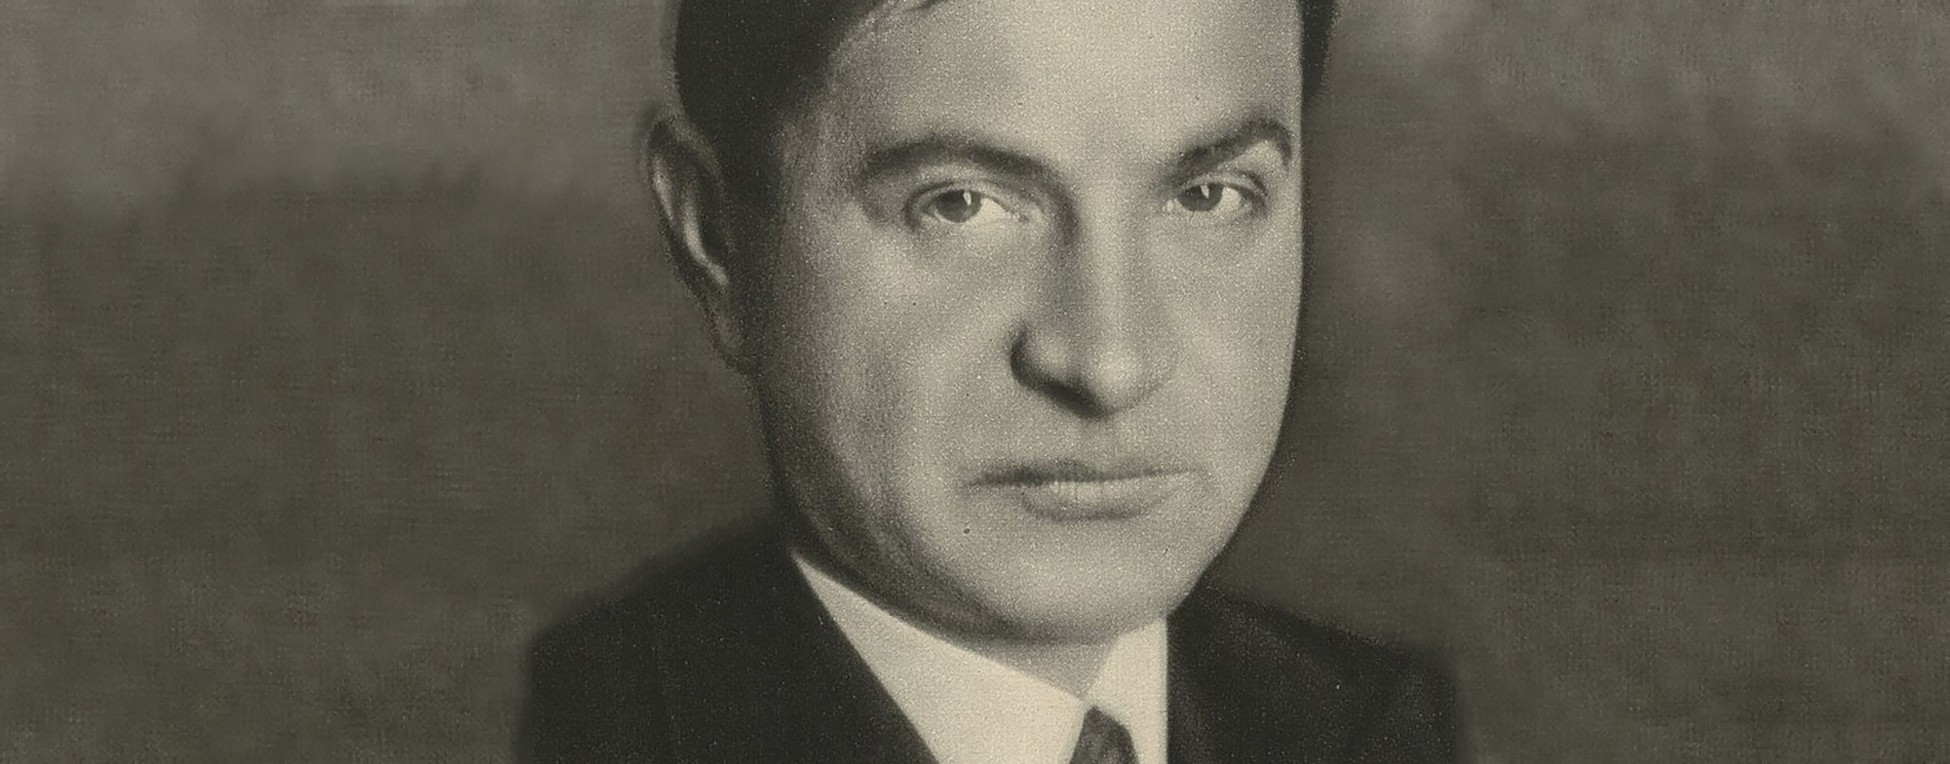 pieracki1950